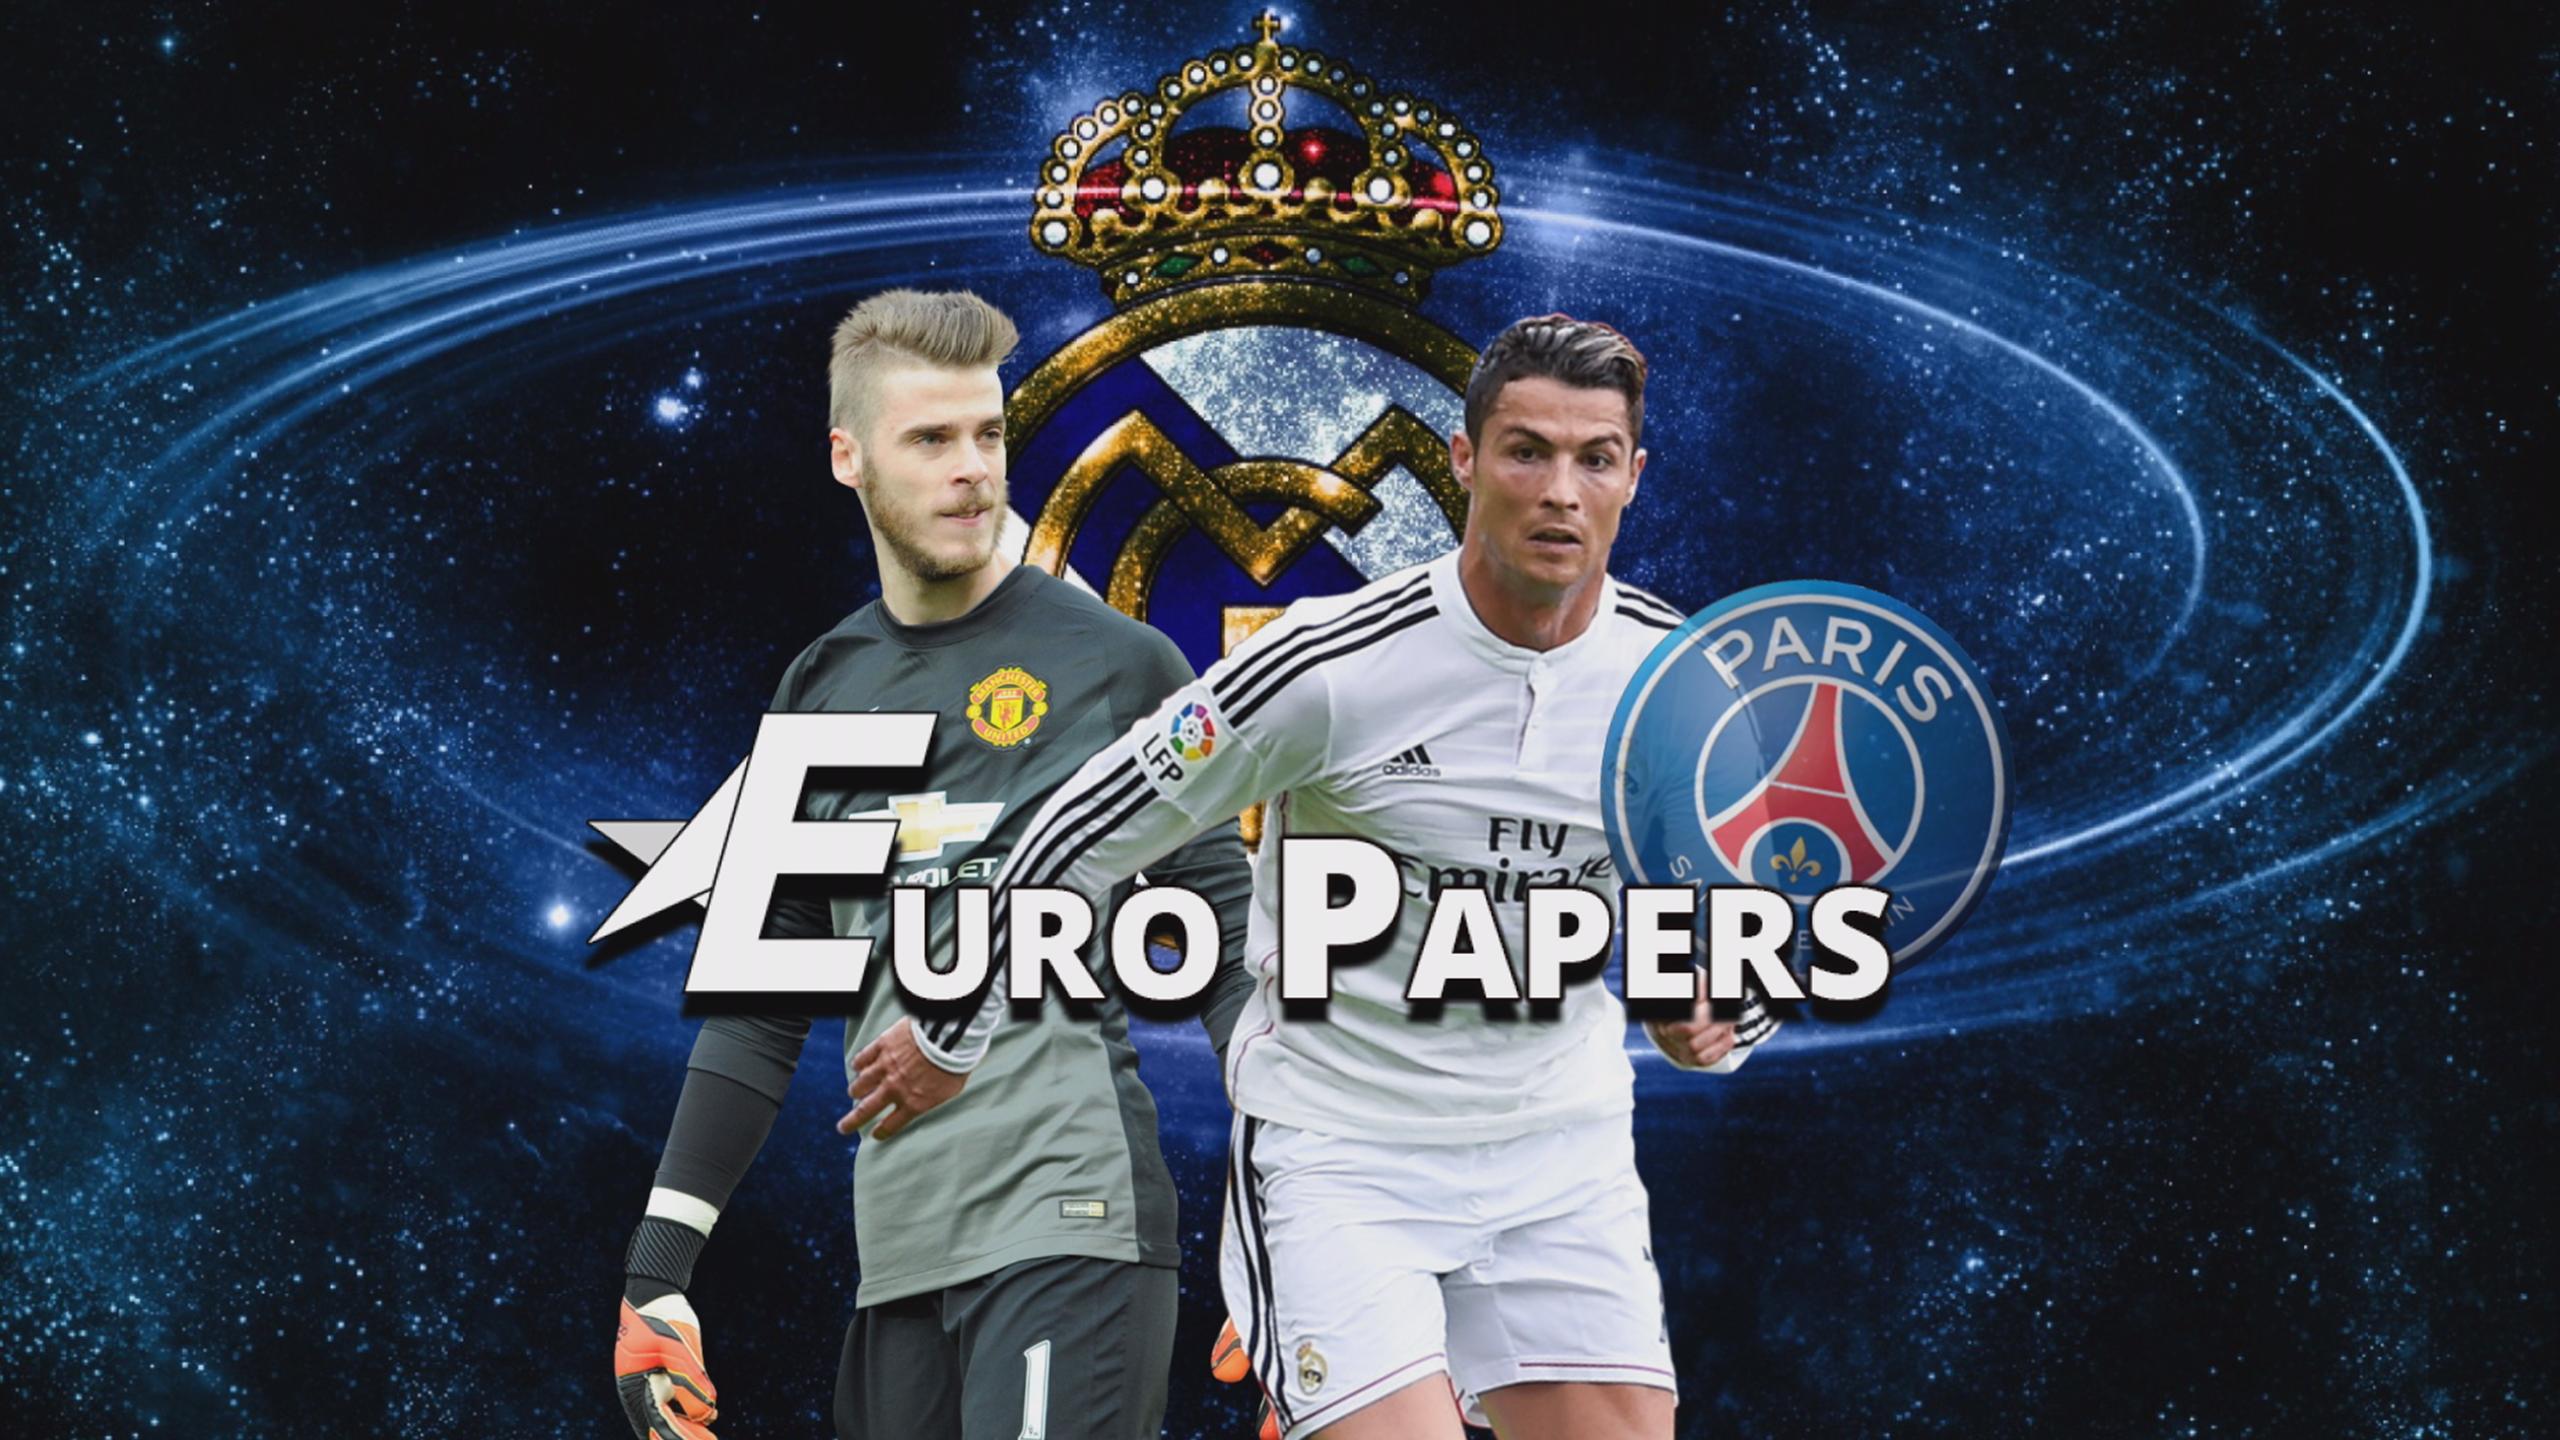 De Gea nears Real Madrid - as PSG threaten Ronaldo move - Euro Papers